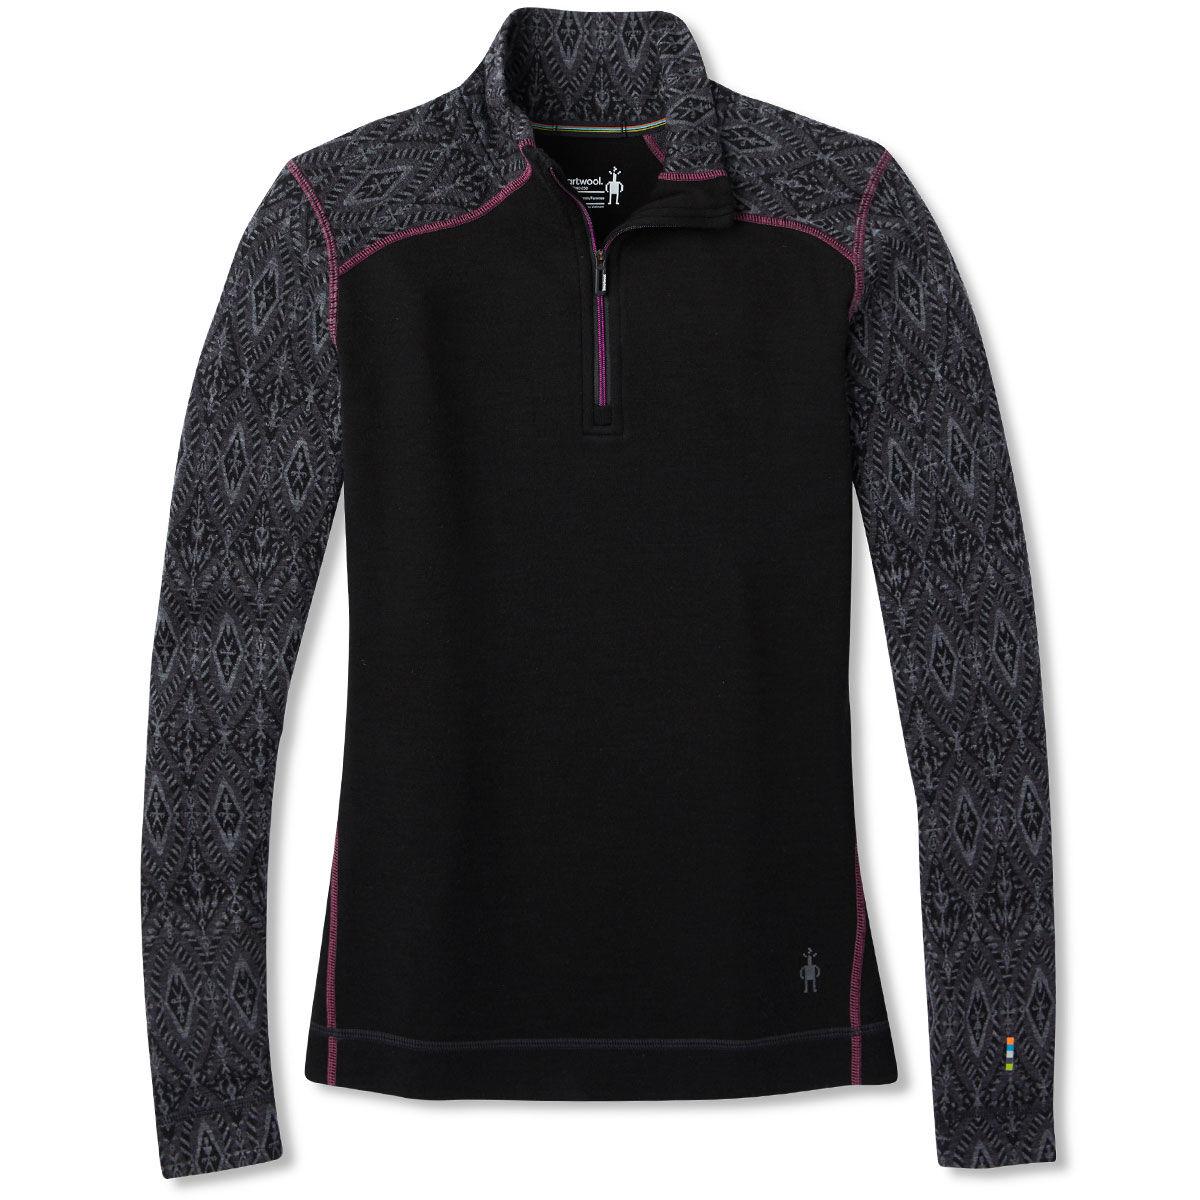 Smartwool Women's Nts Mid 250 Pattern Zip T - Black, M